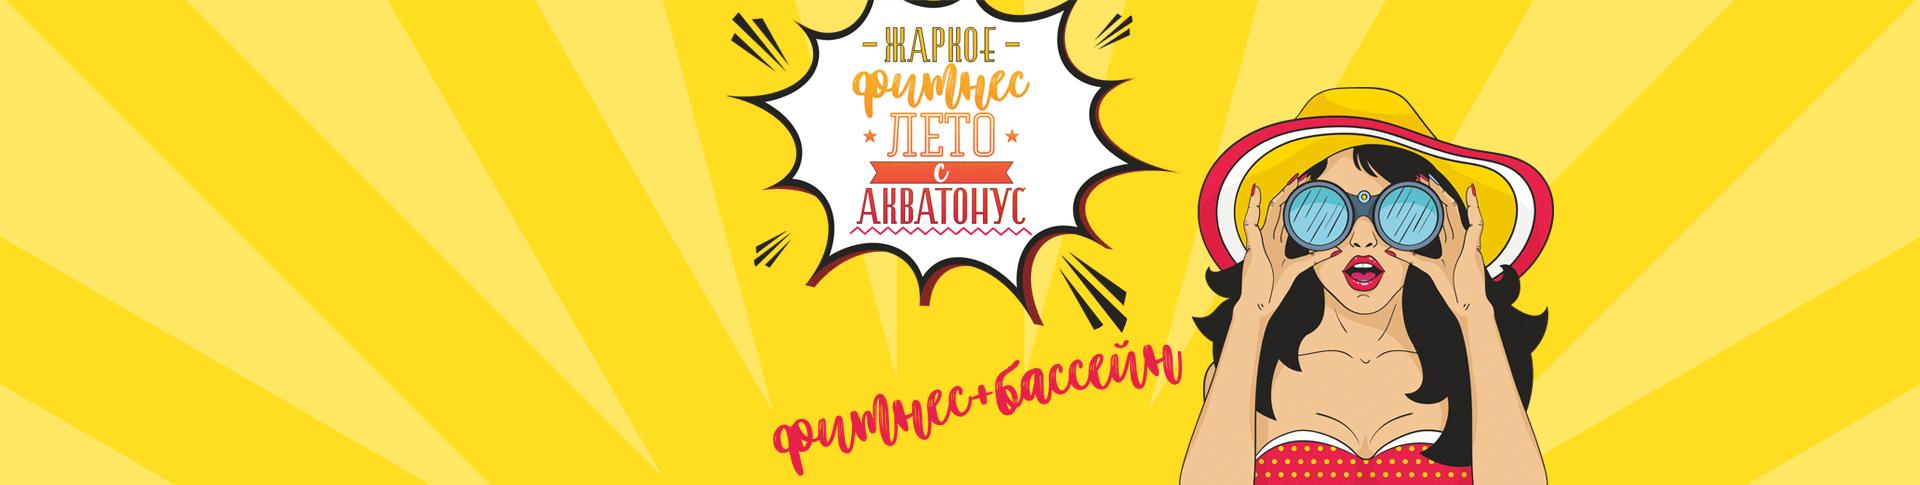 events/zharkoe-fitnes-leto-s-akvatonus